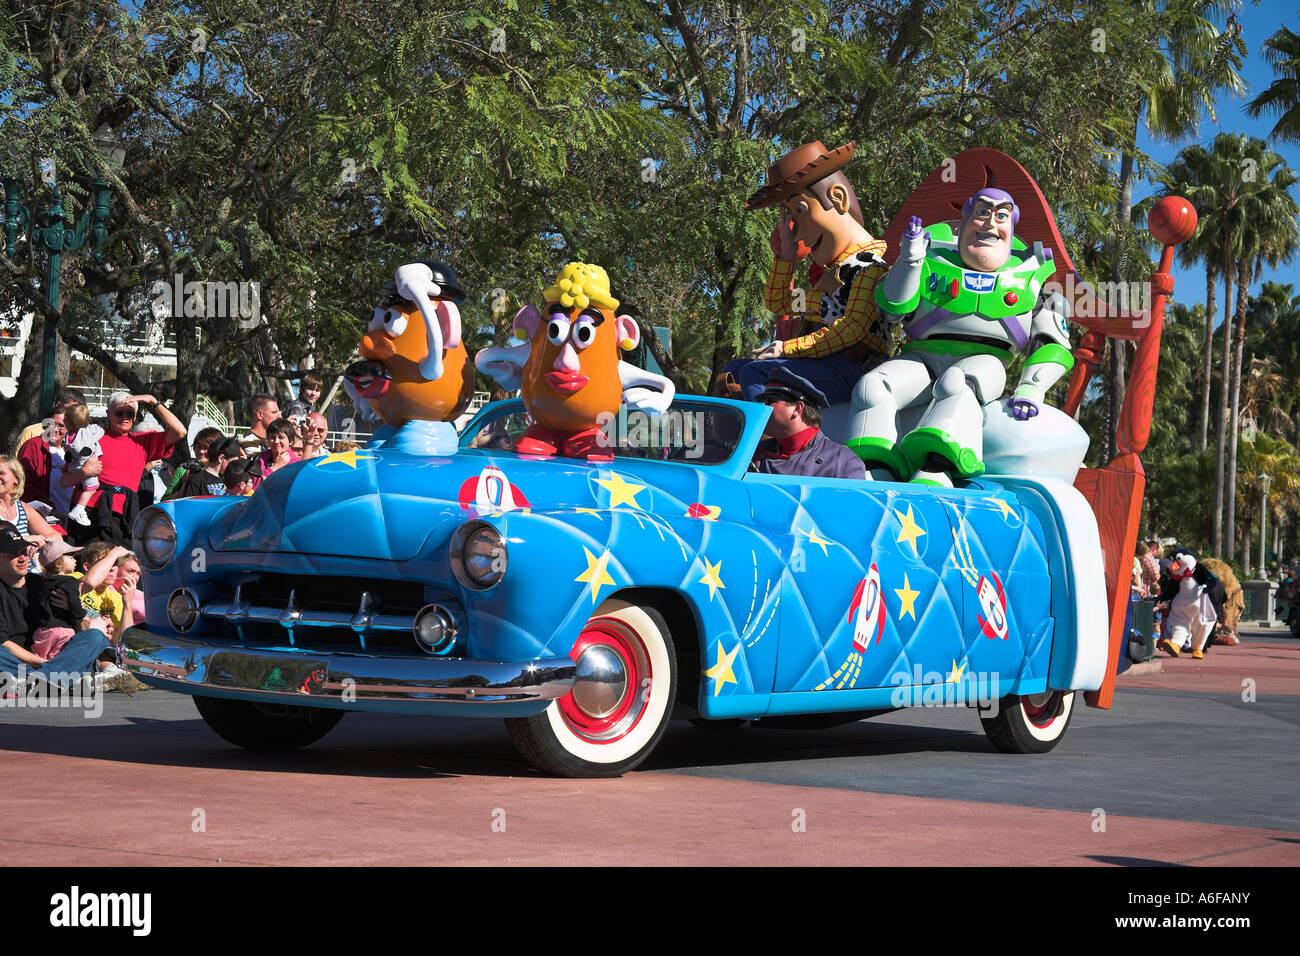 Disney Stars And Motor Cars Parade Buzz Lightyear Potato Heads And Stock Photo Royalty Free